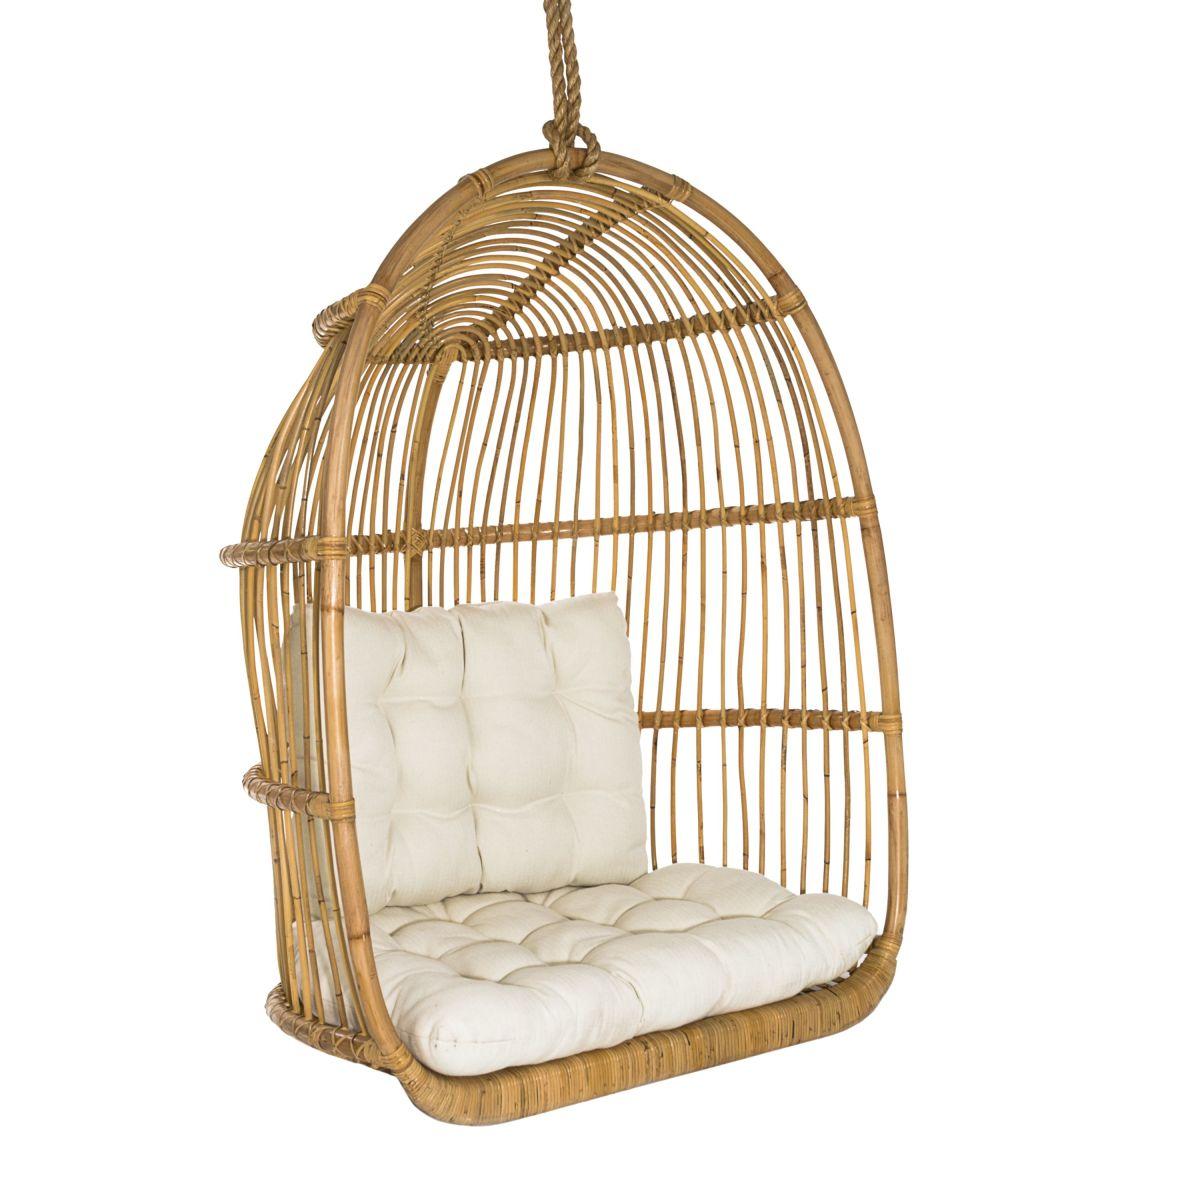 h ngesessel rattankorb natur look versandkostenfreie m bel online bestellen. Black Bedroom Furniture Sets. Home Design Ideas